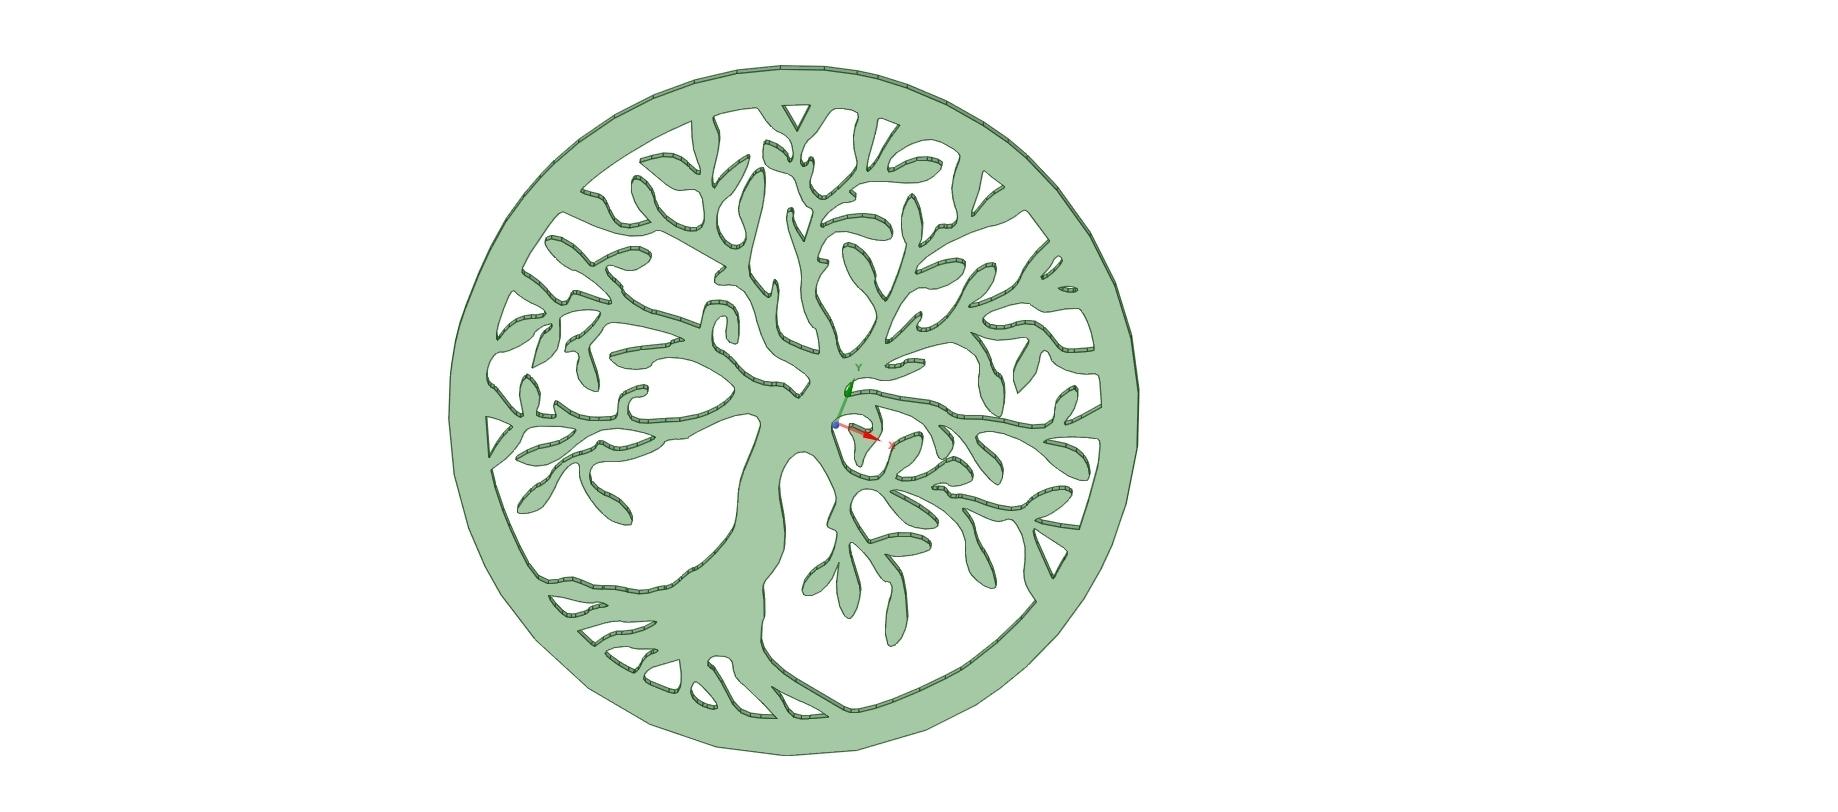 Tree_of_Life.jpg Download free STL file Tree of Life • 3D printer model, simonlewis962